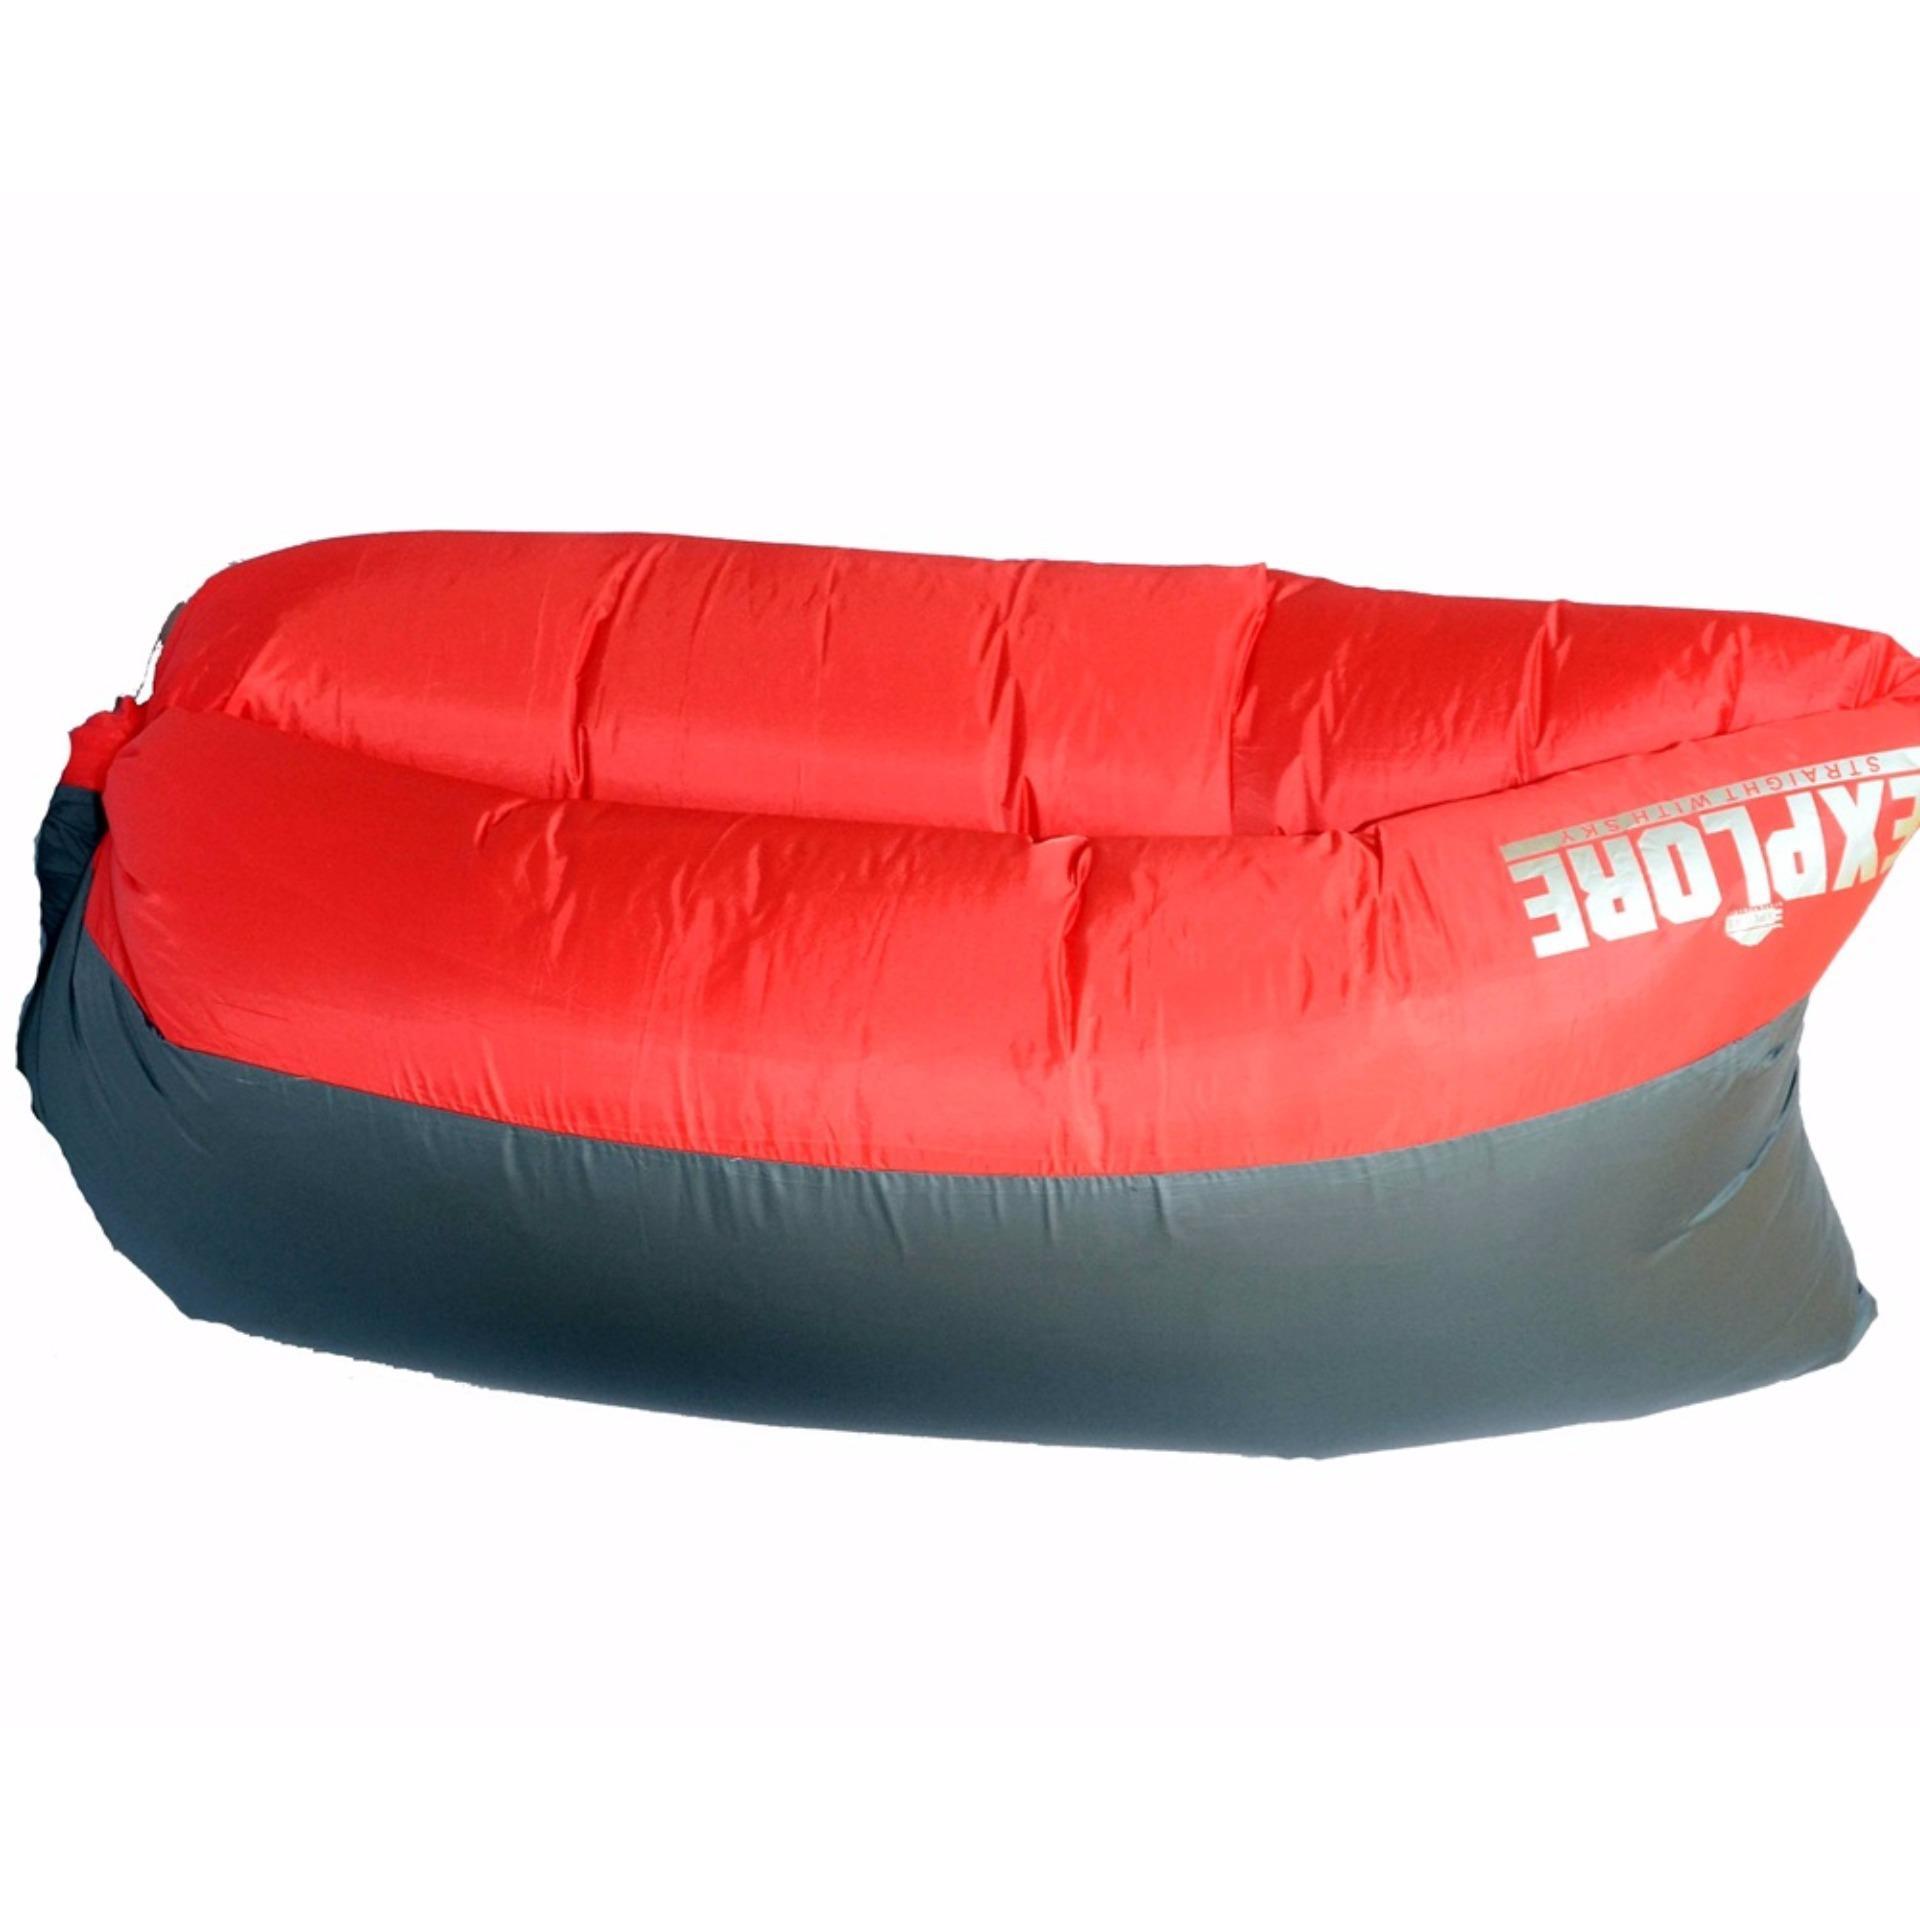 Periksa Peringkat Kasur Tiup Alat Ourdoor Air Bed Lazy Lay Pelampung Bag Bean